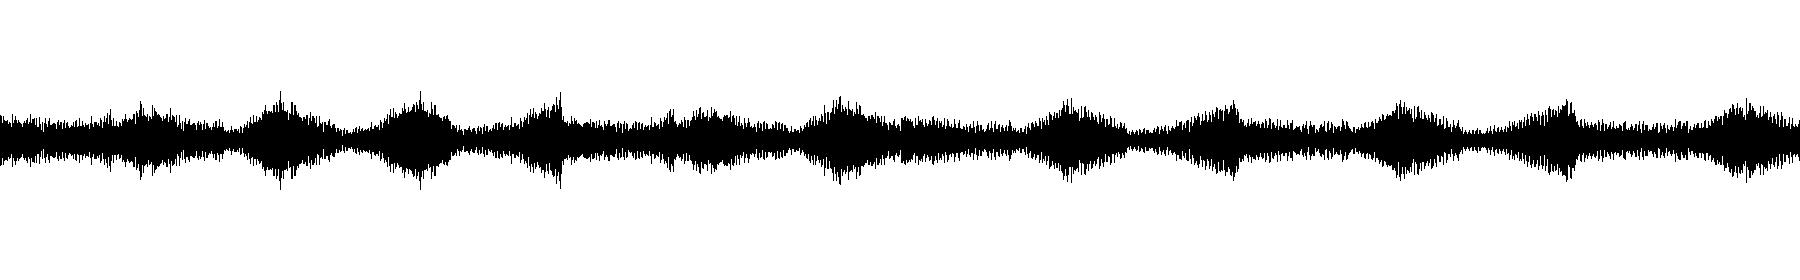 pth synth 17